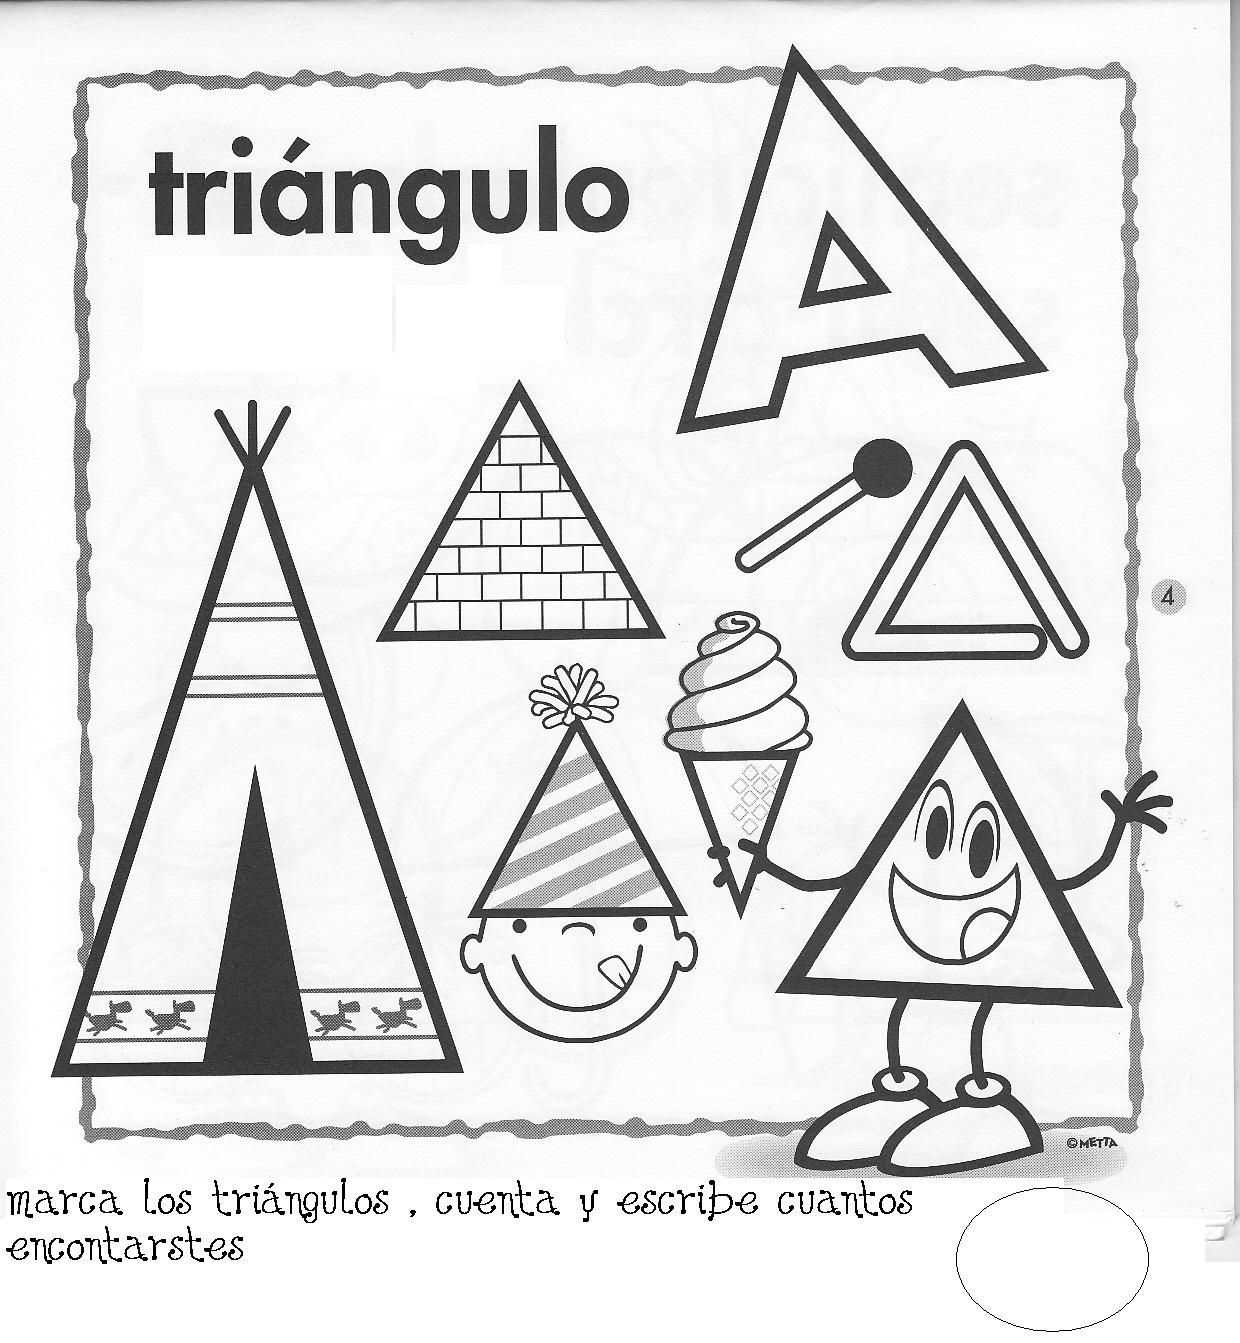 Fichas Para Pintar Fichas Figuras Geometricas Fichas De Figuras